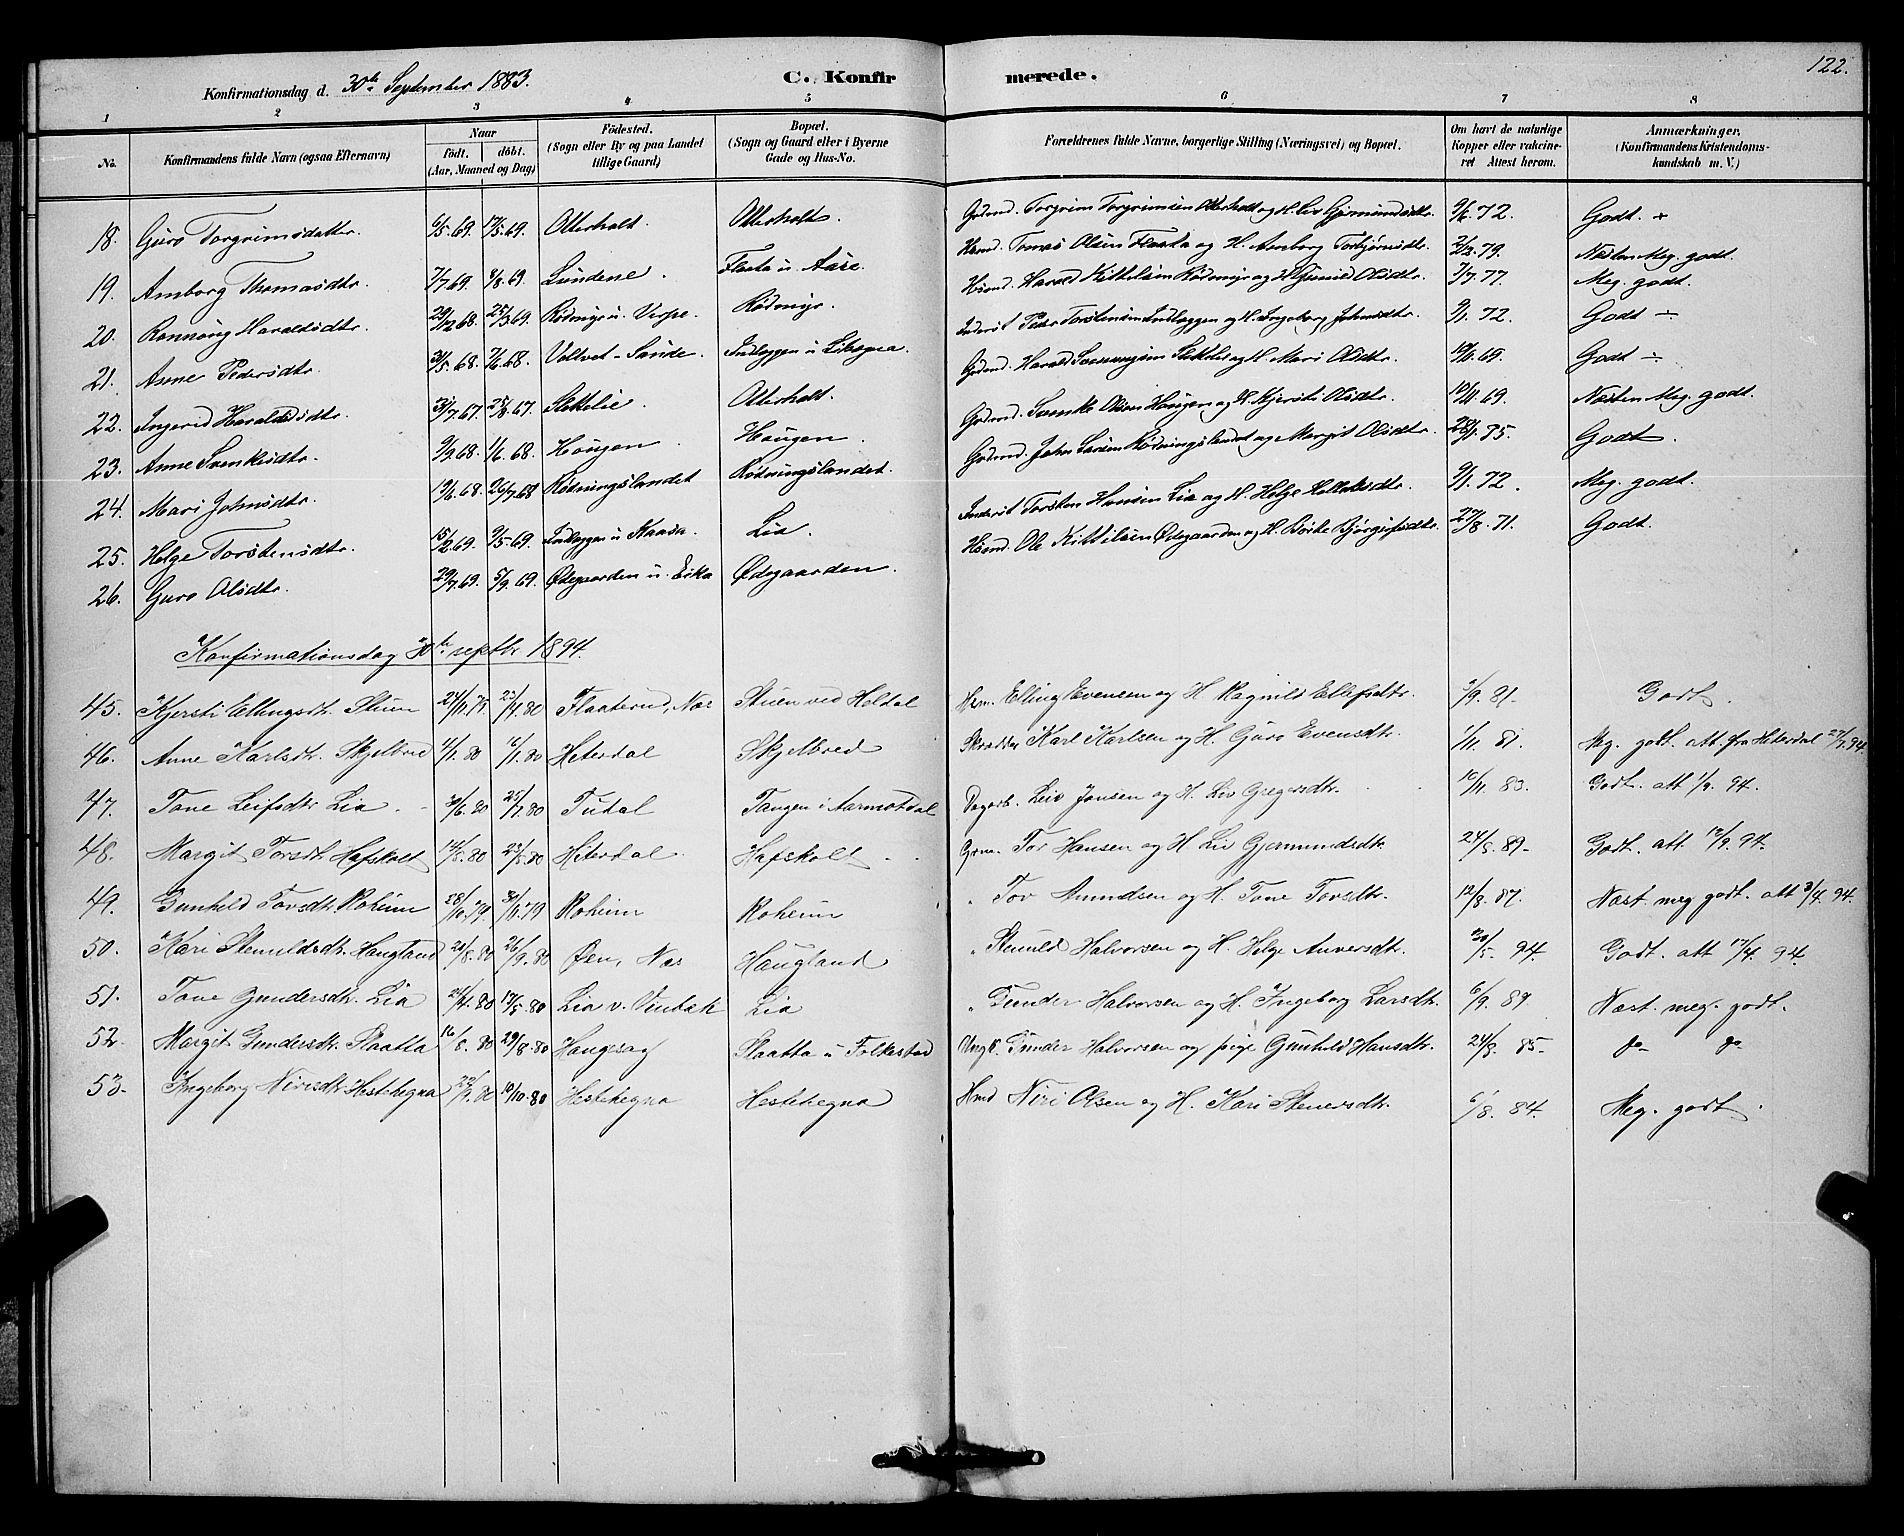 SAKO, Bø kirkebøker, G/Ga/L0005: Klokkerbok nr. 5, 1883-1897, s. 122